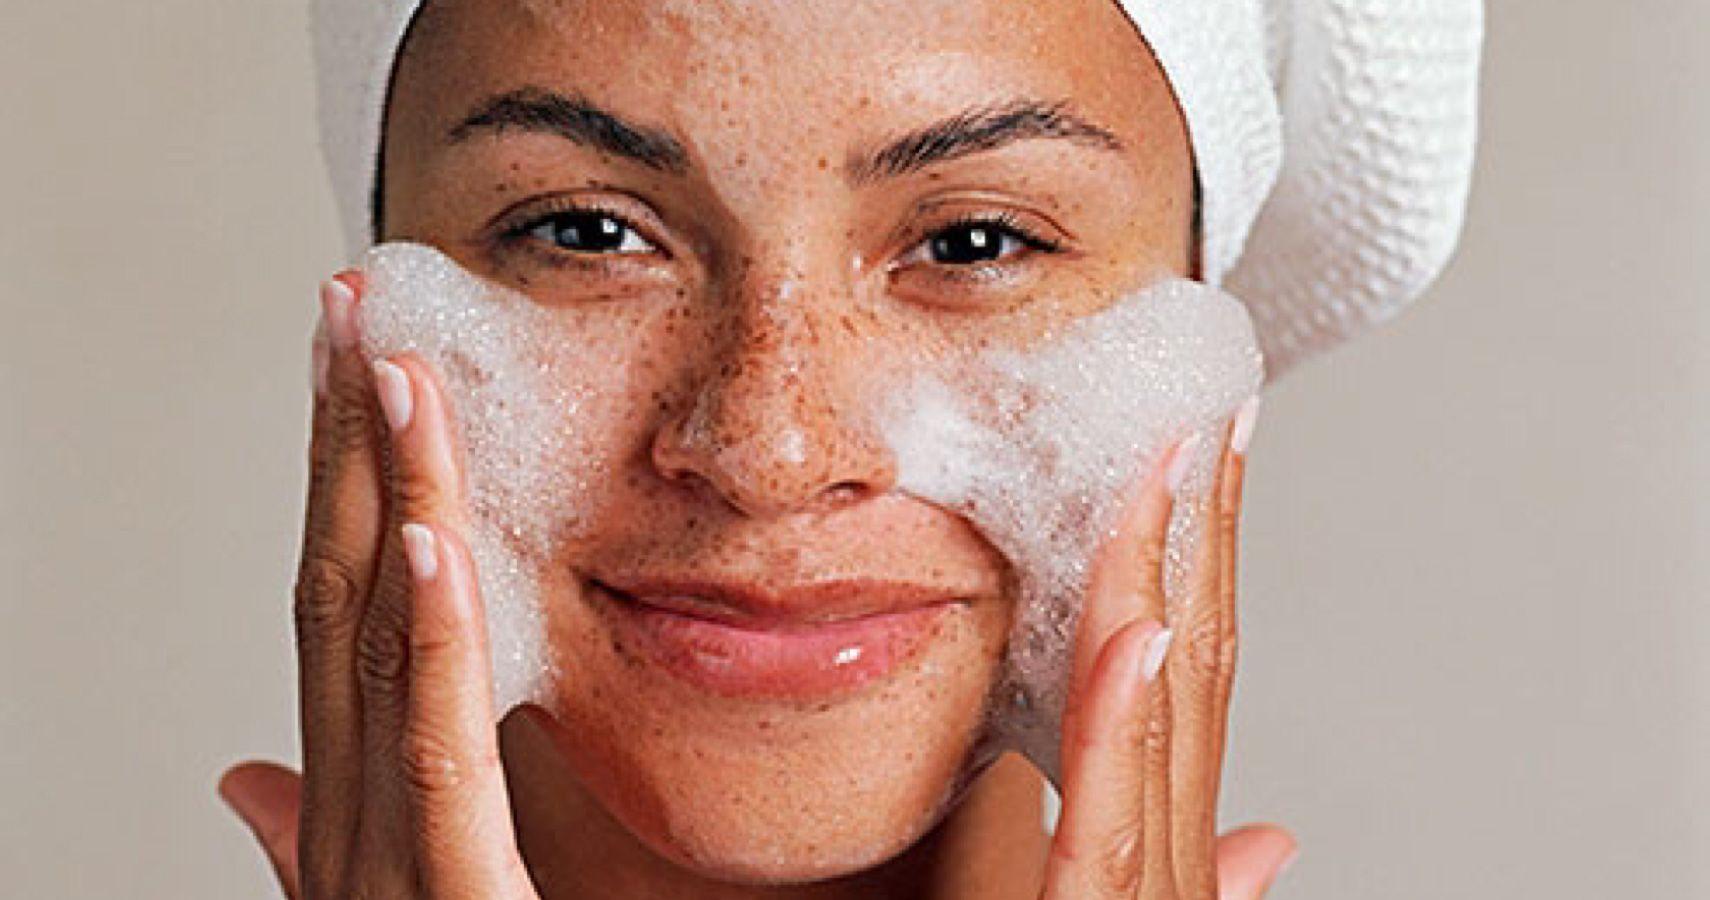 Dermatologist Recommends A Pregnancy-Safe Skincare Routine